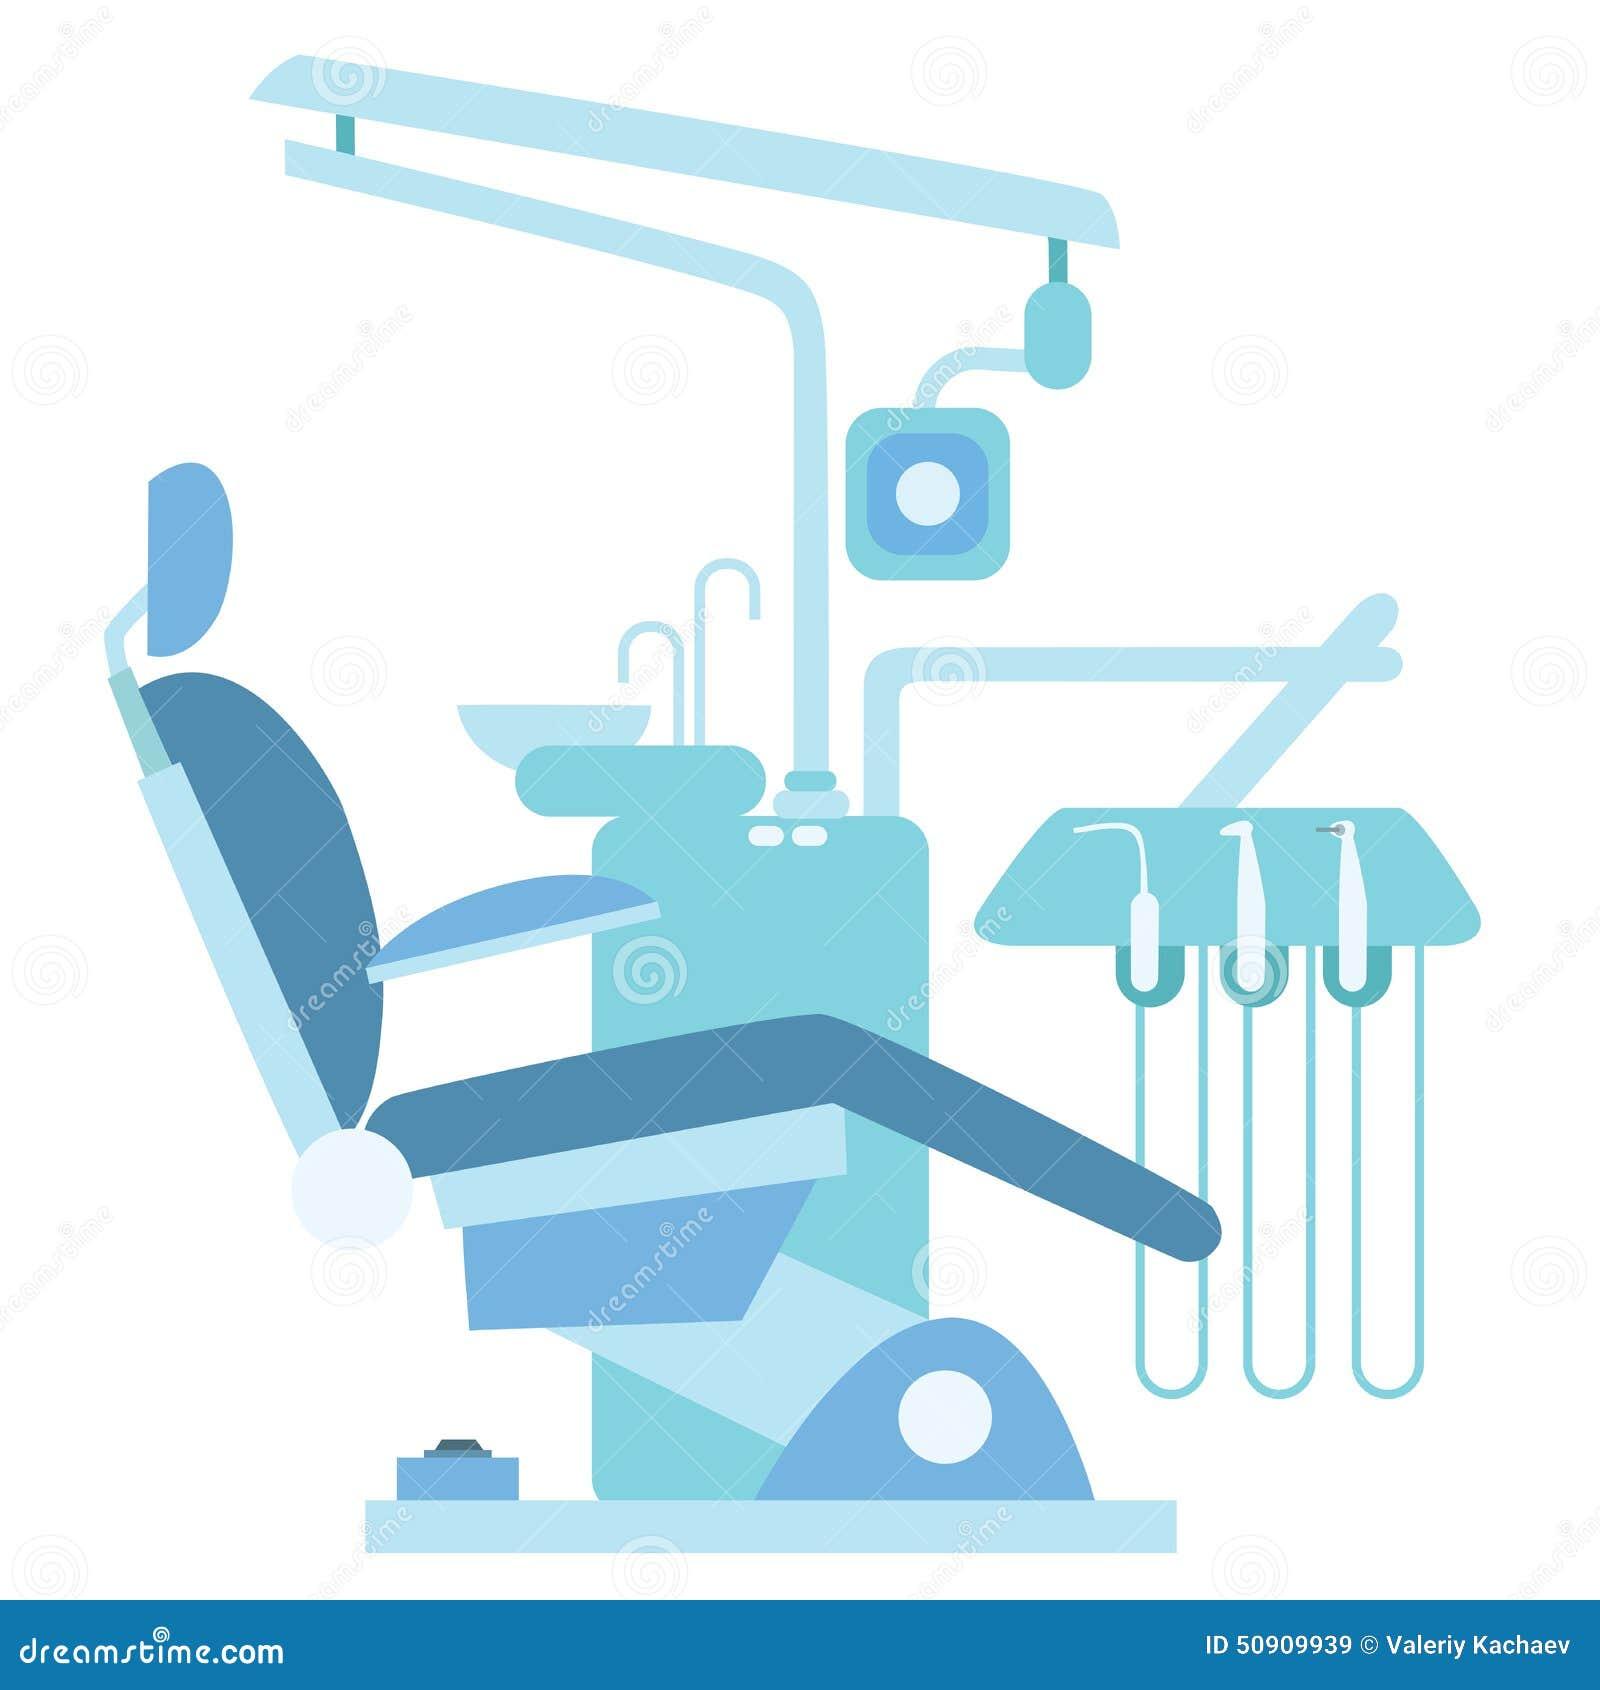 Dental dreams jobs